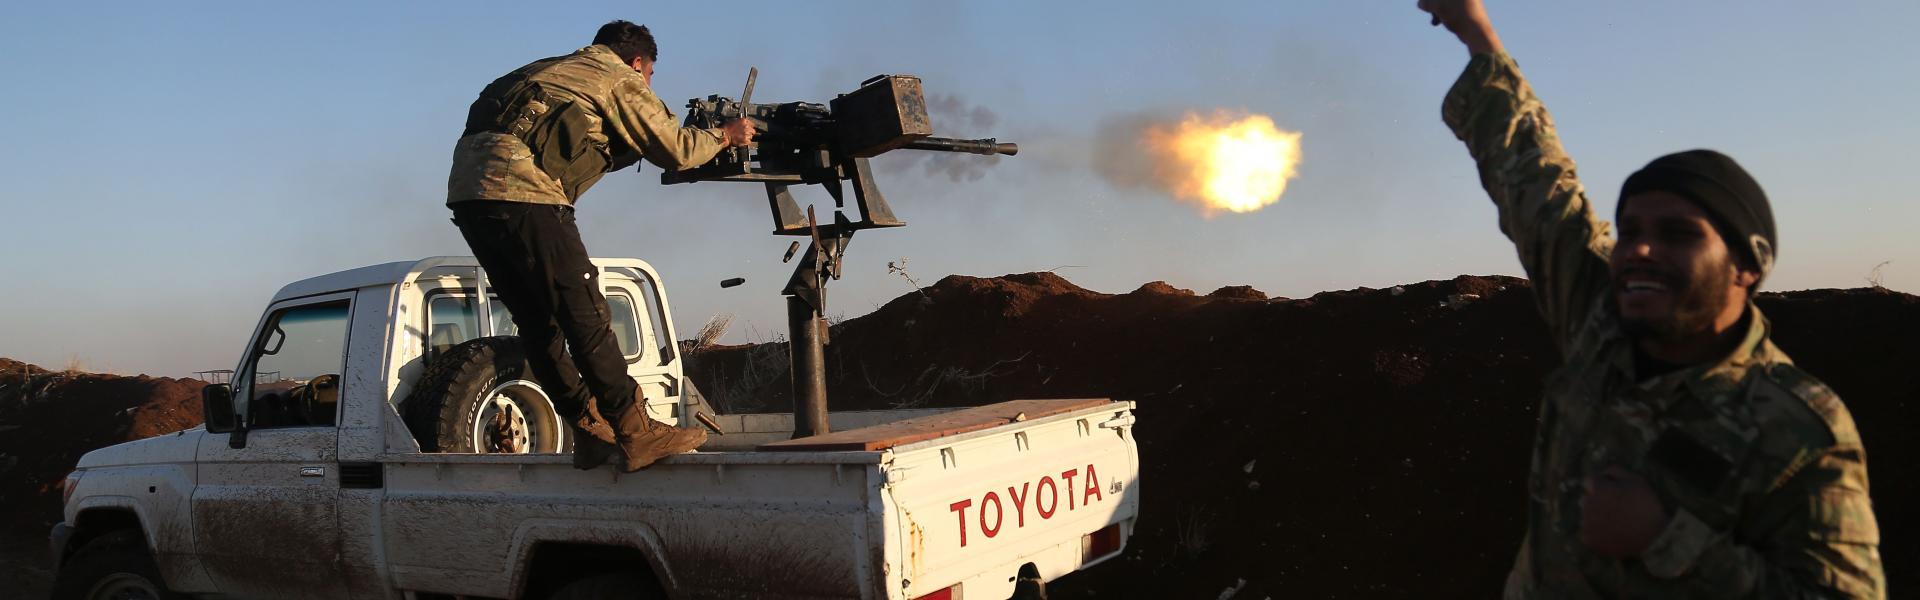 Rusya'nın 'Afrin'i Esad'a ver' talebi YPG tarafından reddedilince..